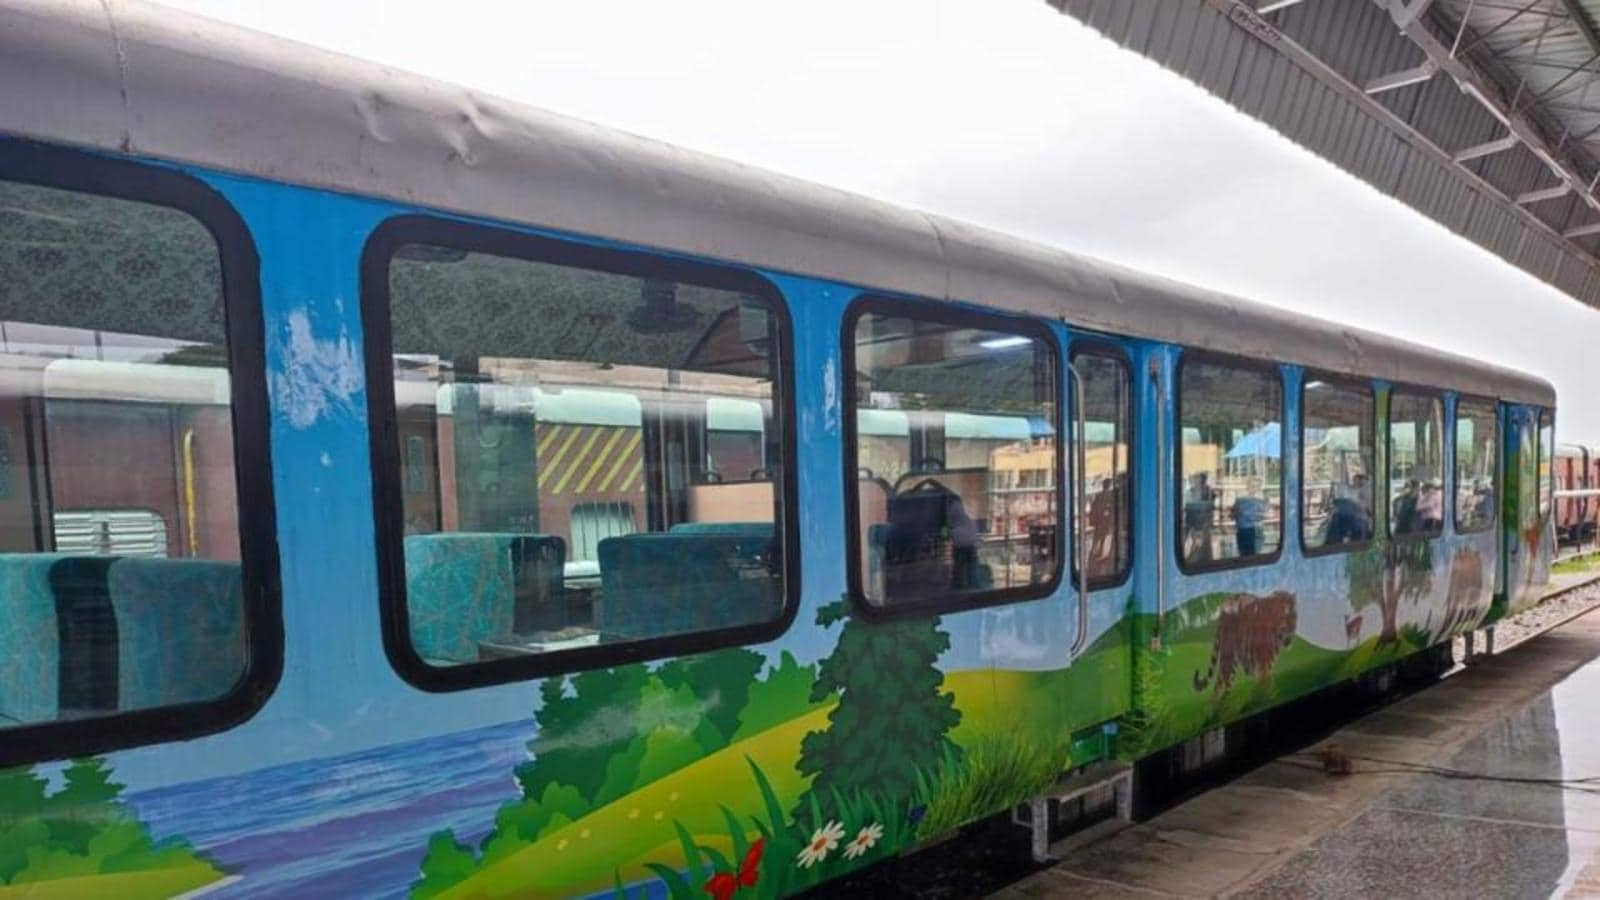 Uttar Pradesh's first toy train via Dudhwa likely to start its run soon